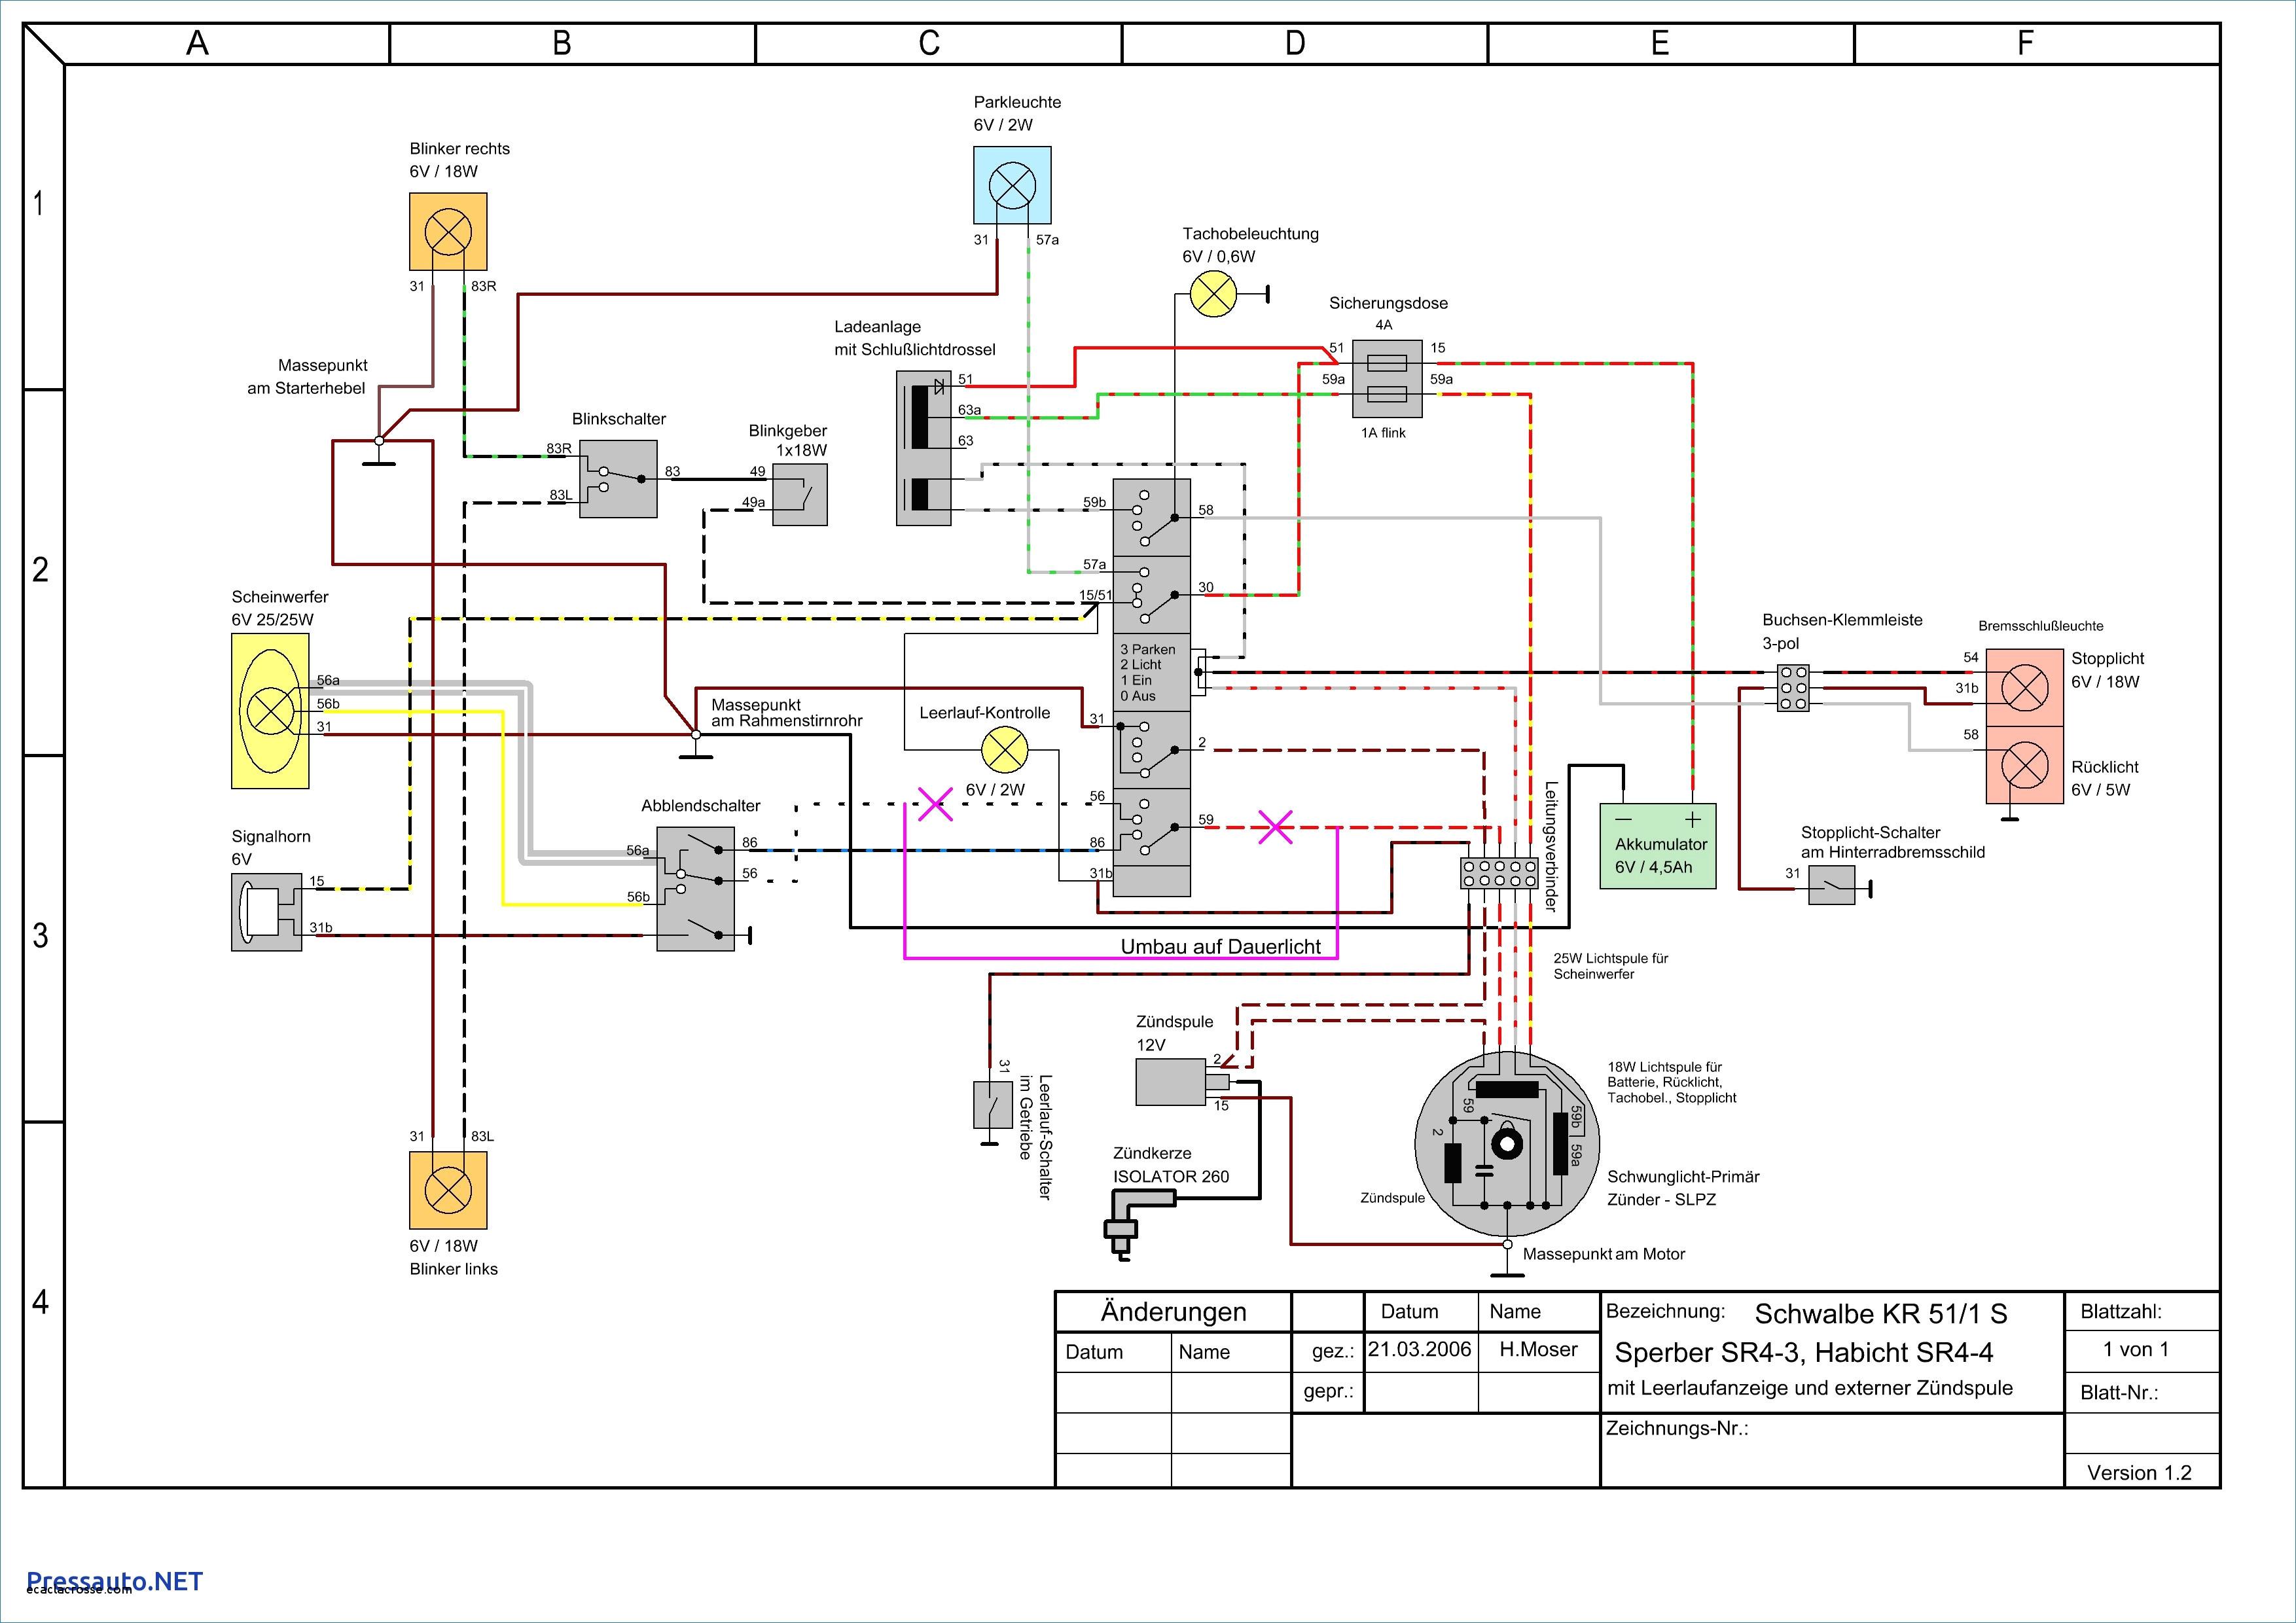 Zing Ear Ze 208D Wiring Diagram | Wiring Diagram - Zing Ear Ze-208S Wiring Diagram